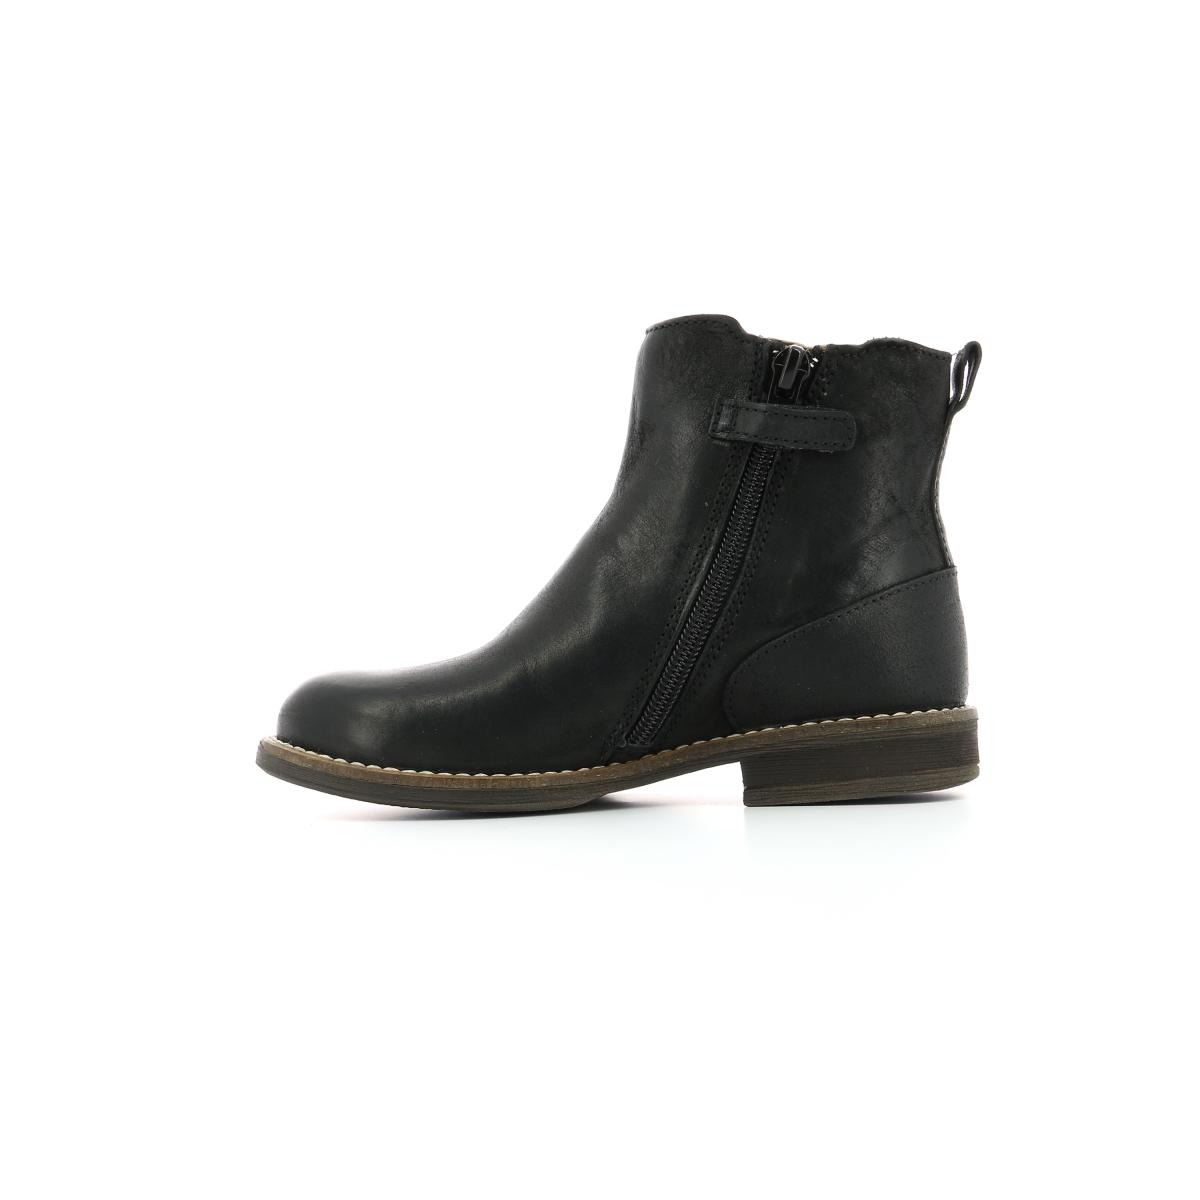 7f9e16420fffc3 Chaussures Enfant SMAD NOIR - Kickers